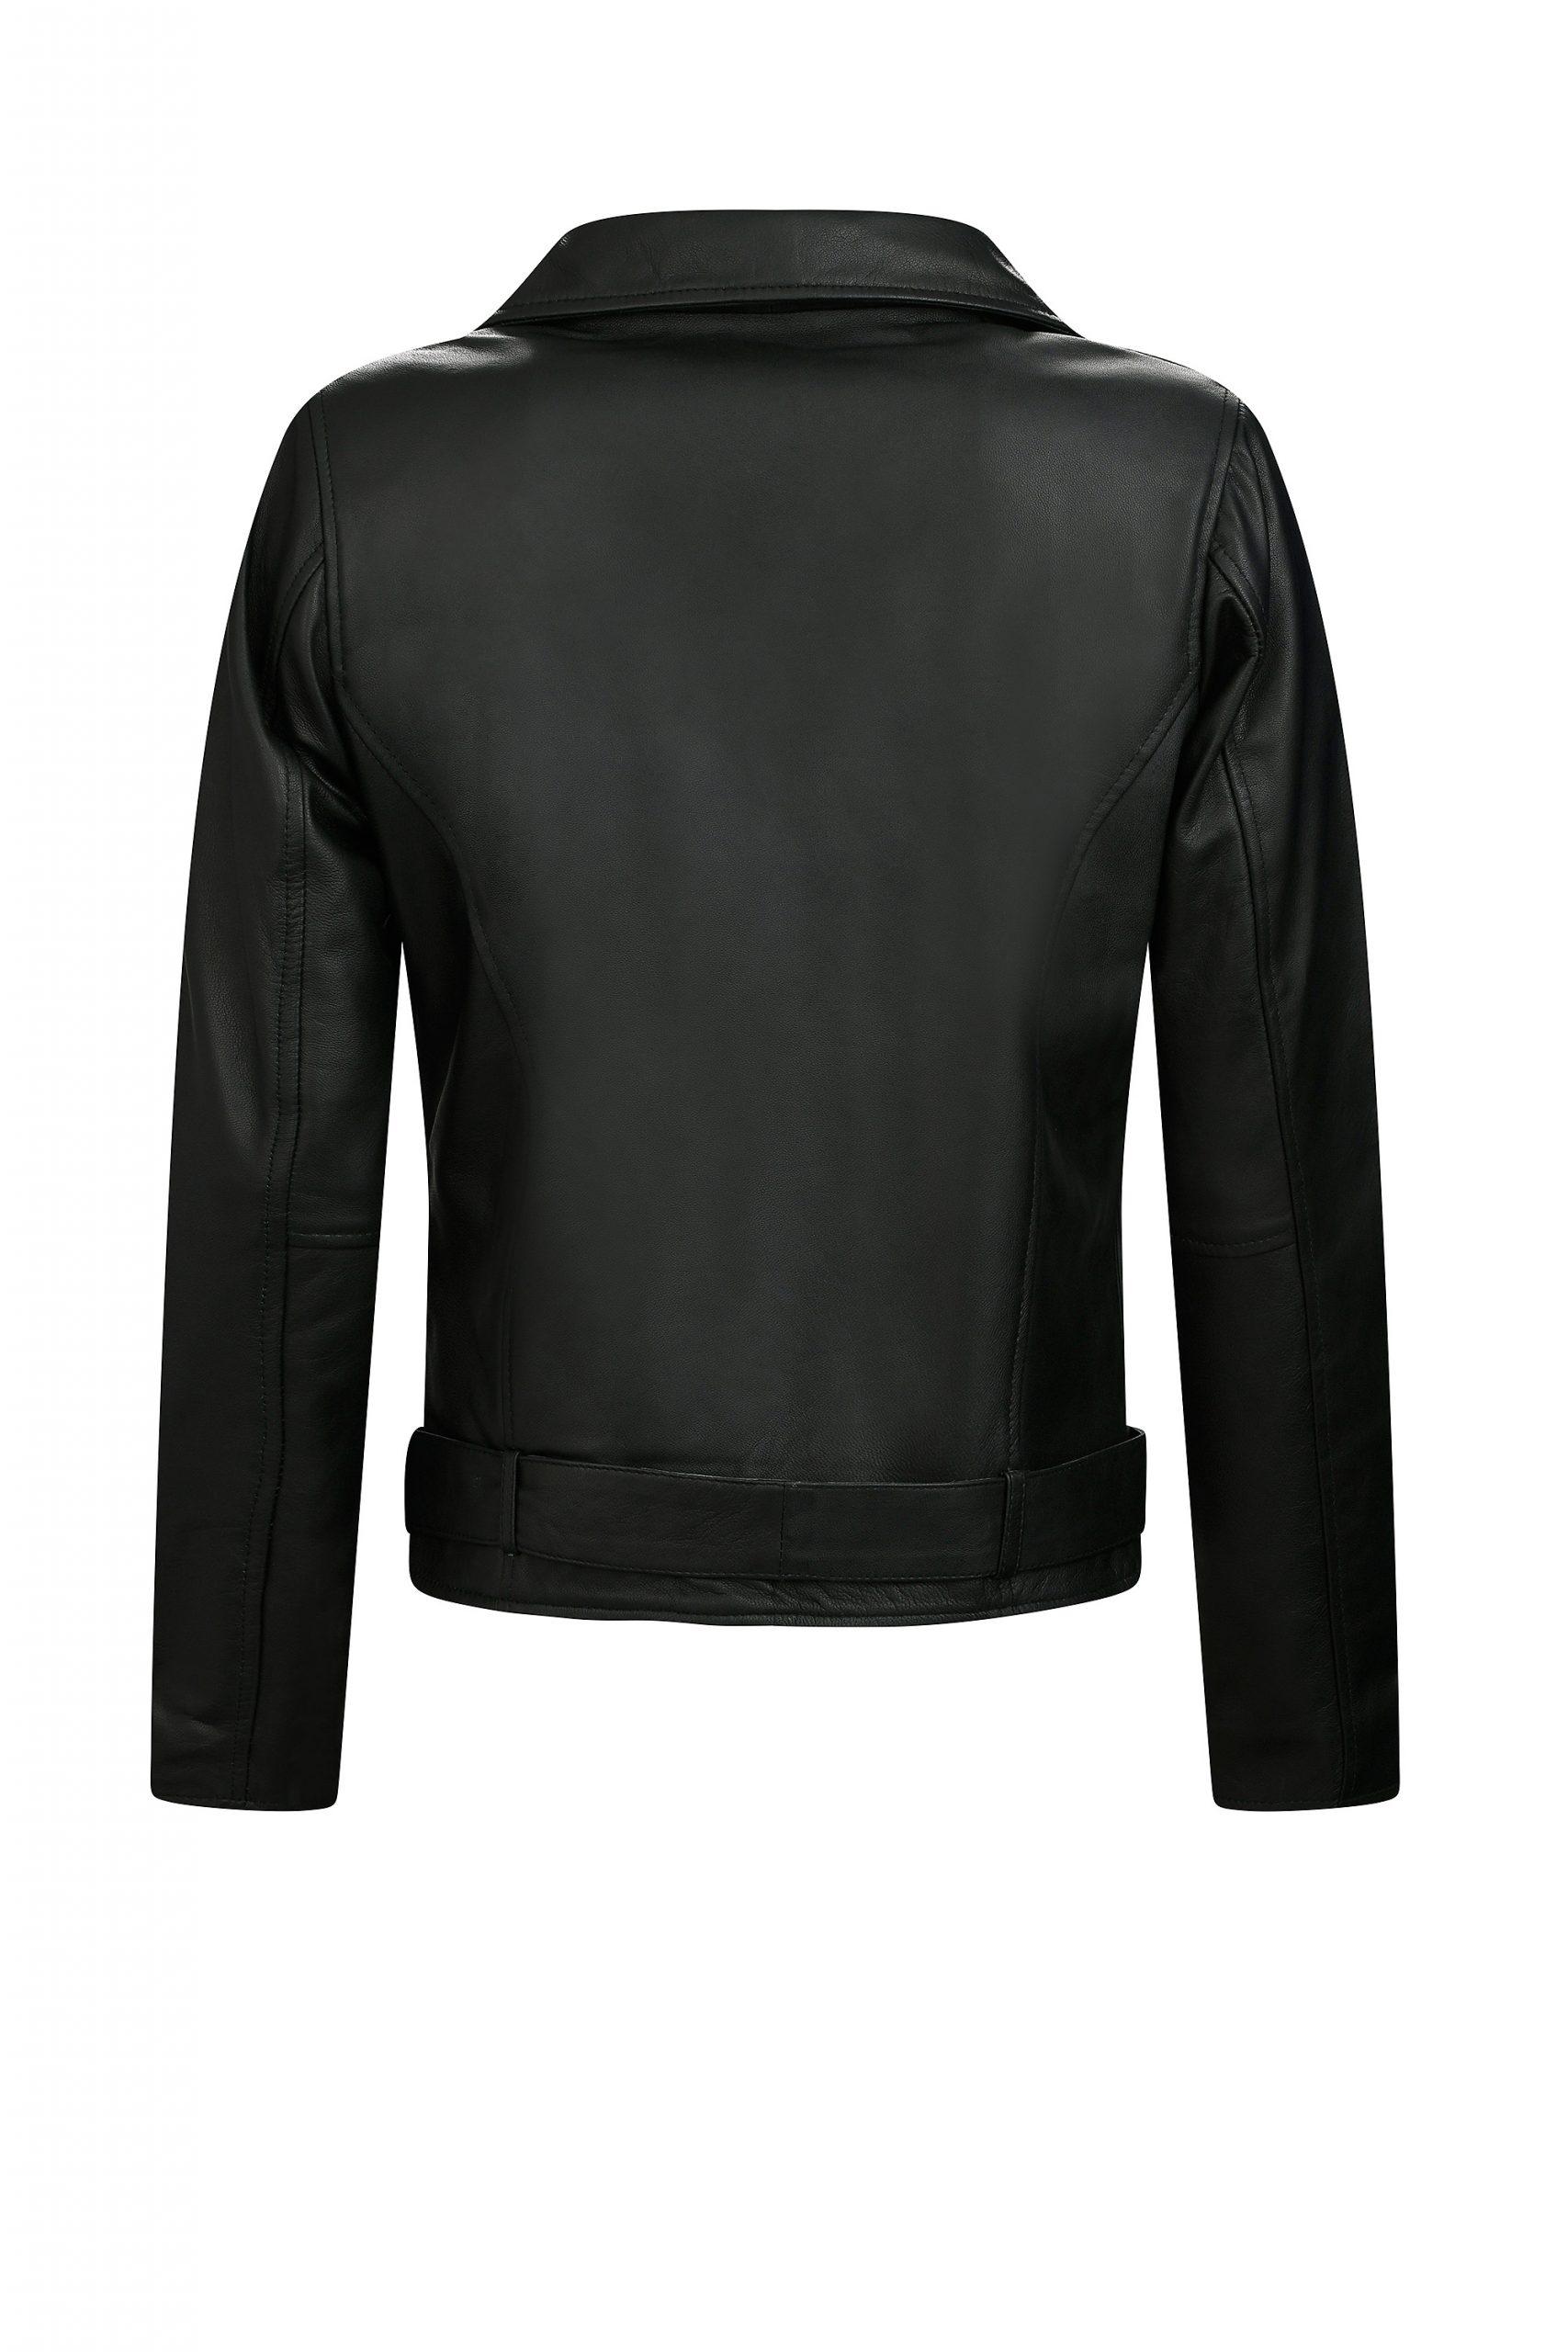 Chinco-Kendall biker zwart